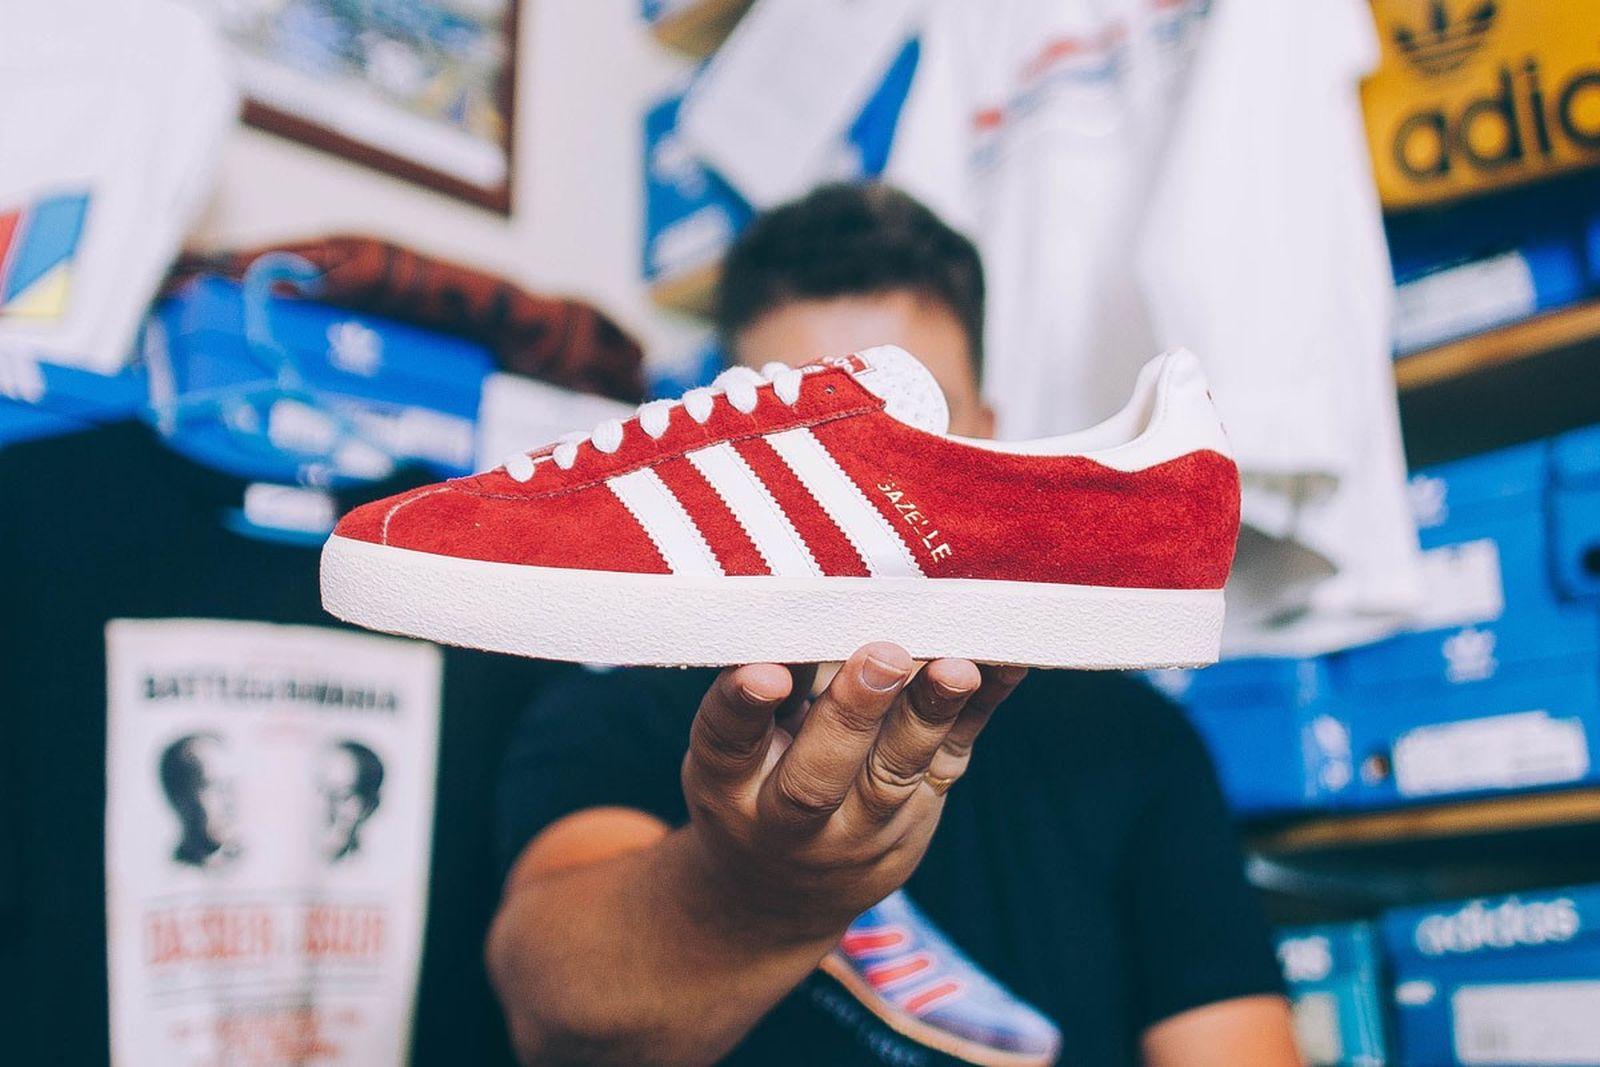 terrace footwear sneaker history dasslers finest collector interview main top Adidas diadora